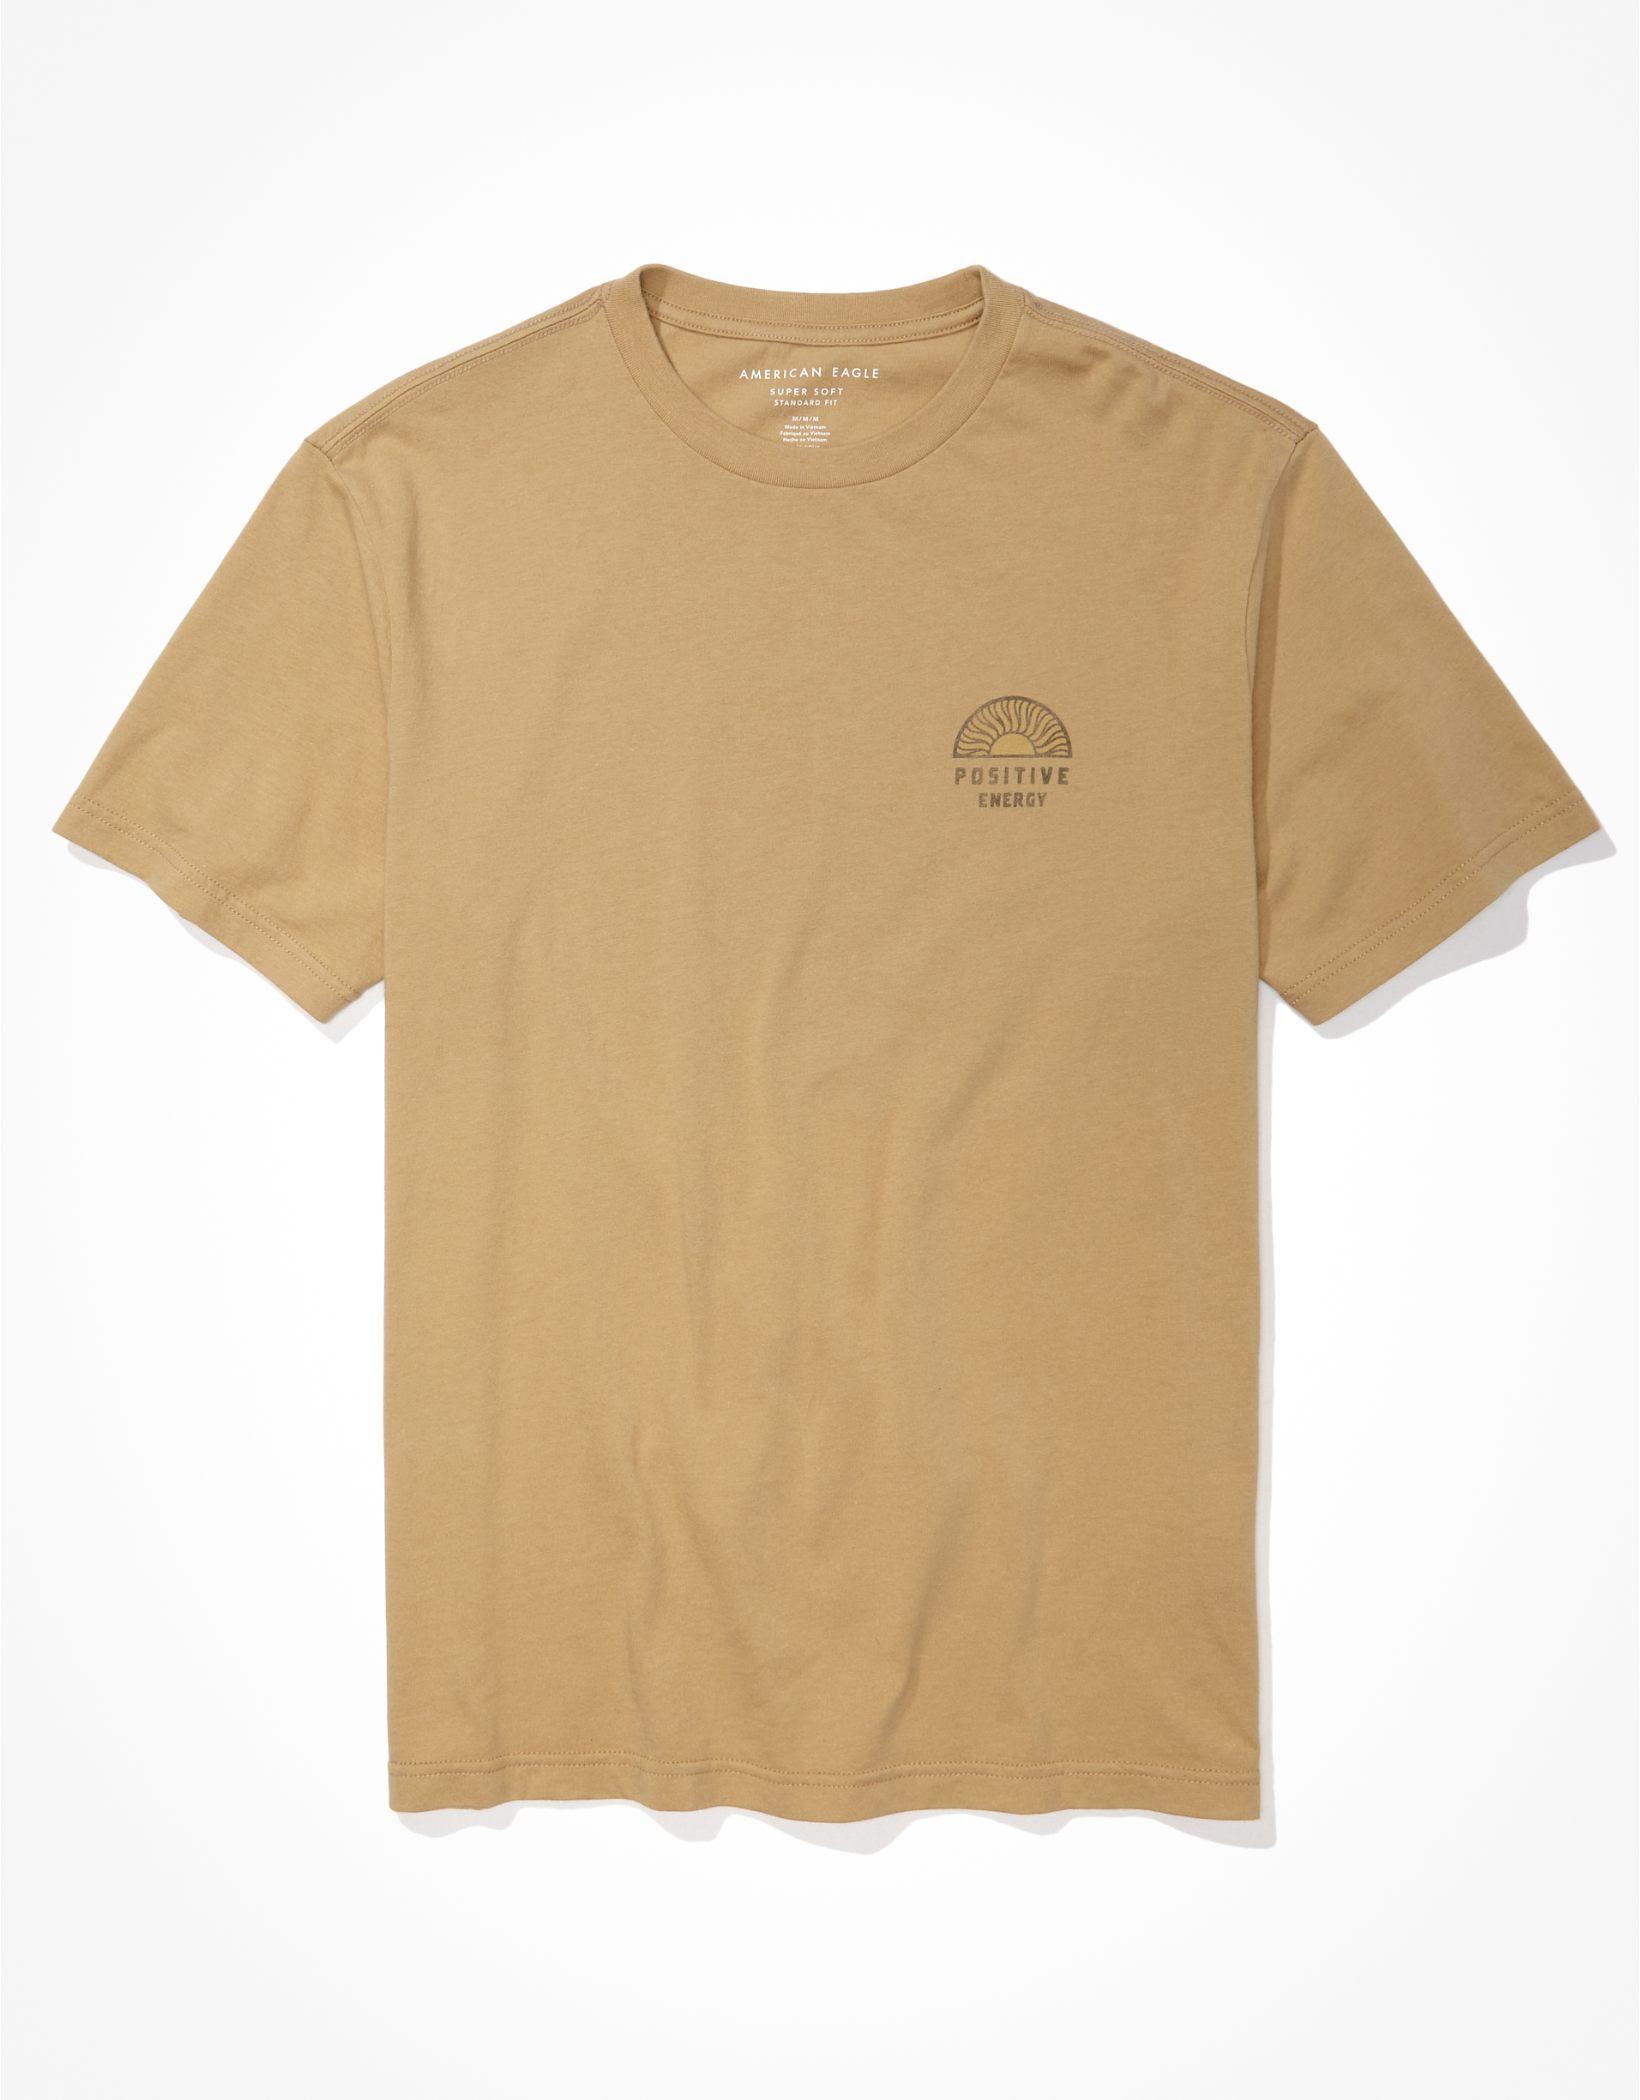 AE Super Soft Positive Graphic T-Shirt